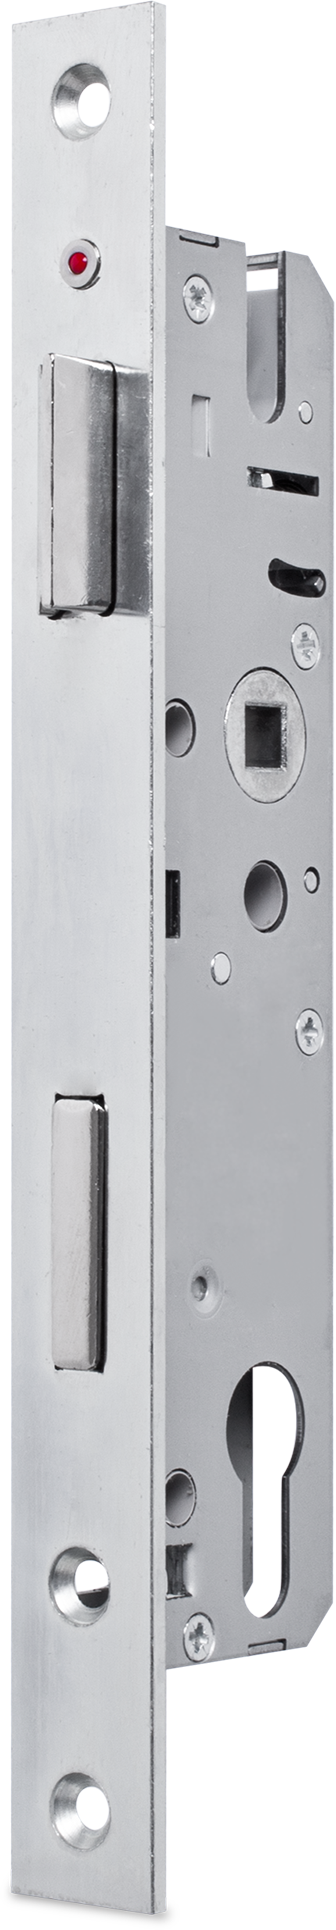 Einsteckschloss mit Wechsel, Dornmaß 35 mm, Entfernung 92 mm, Vierkantnuss 8 mm, Falle und Riegel bündig, Riegel mit Stahlstift, DIN rechts / links verwendbar